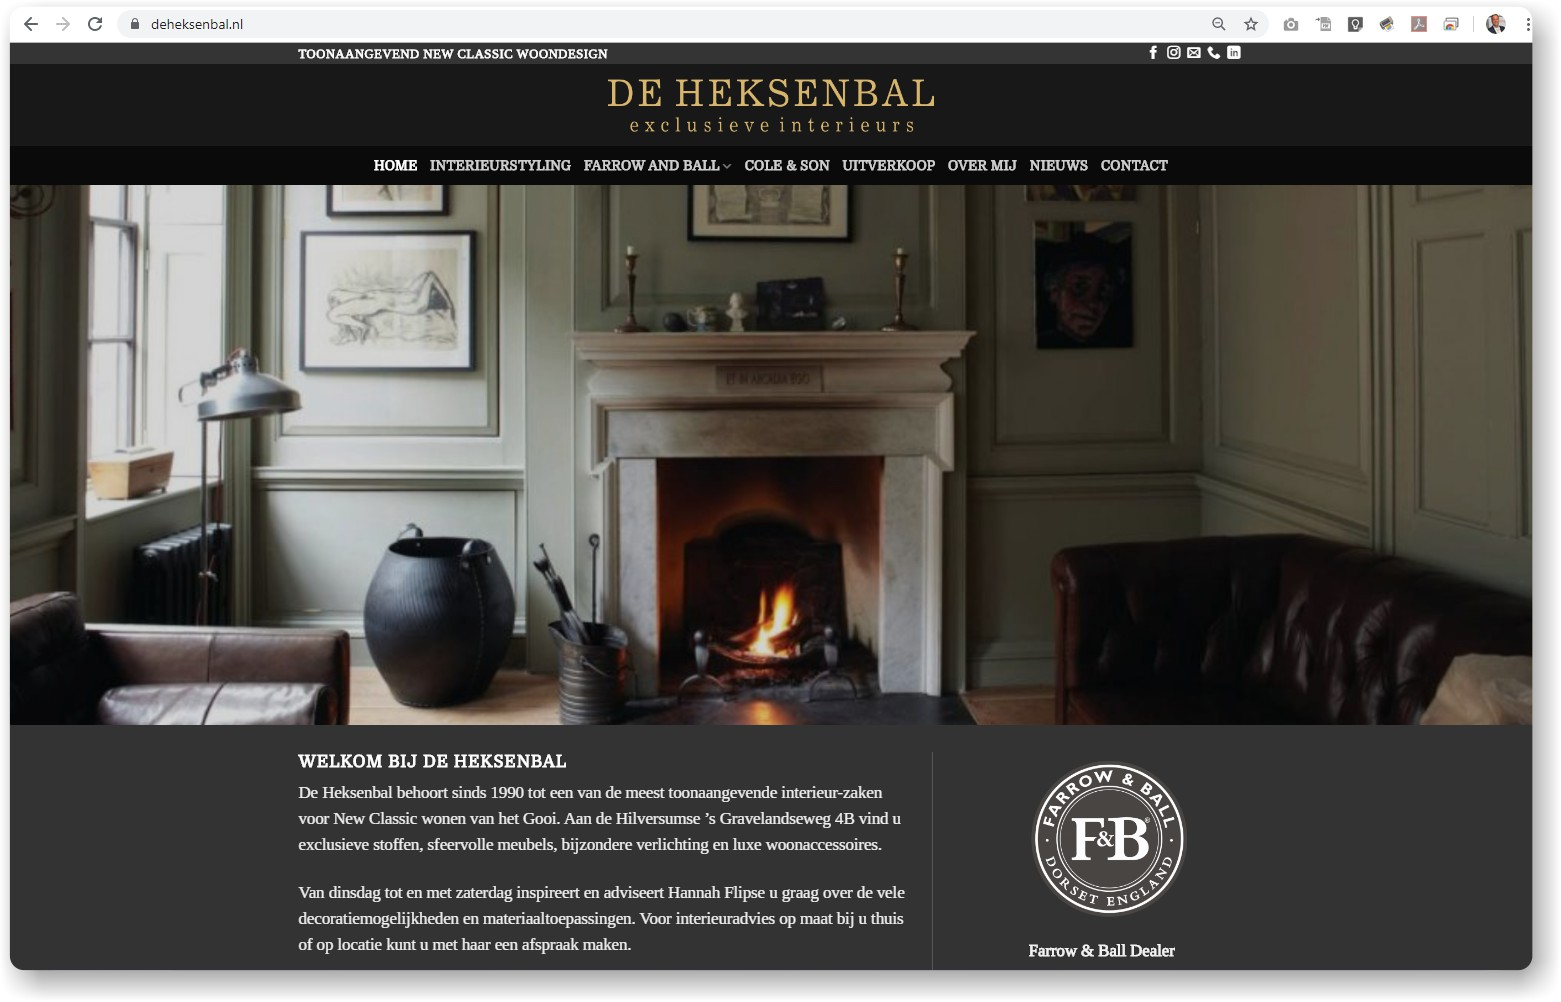 +++www.deheksenbal.nl